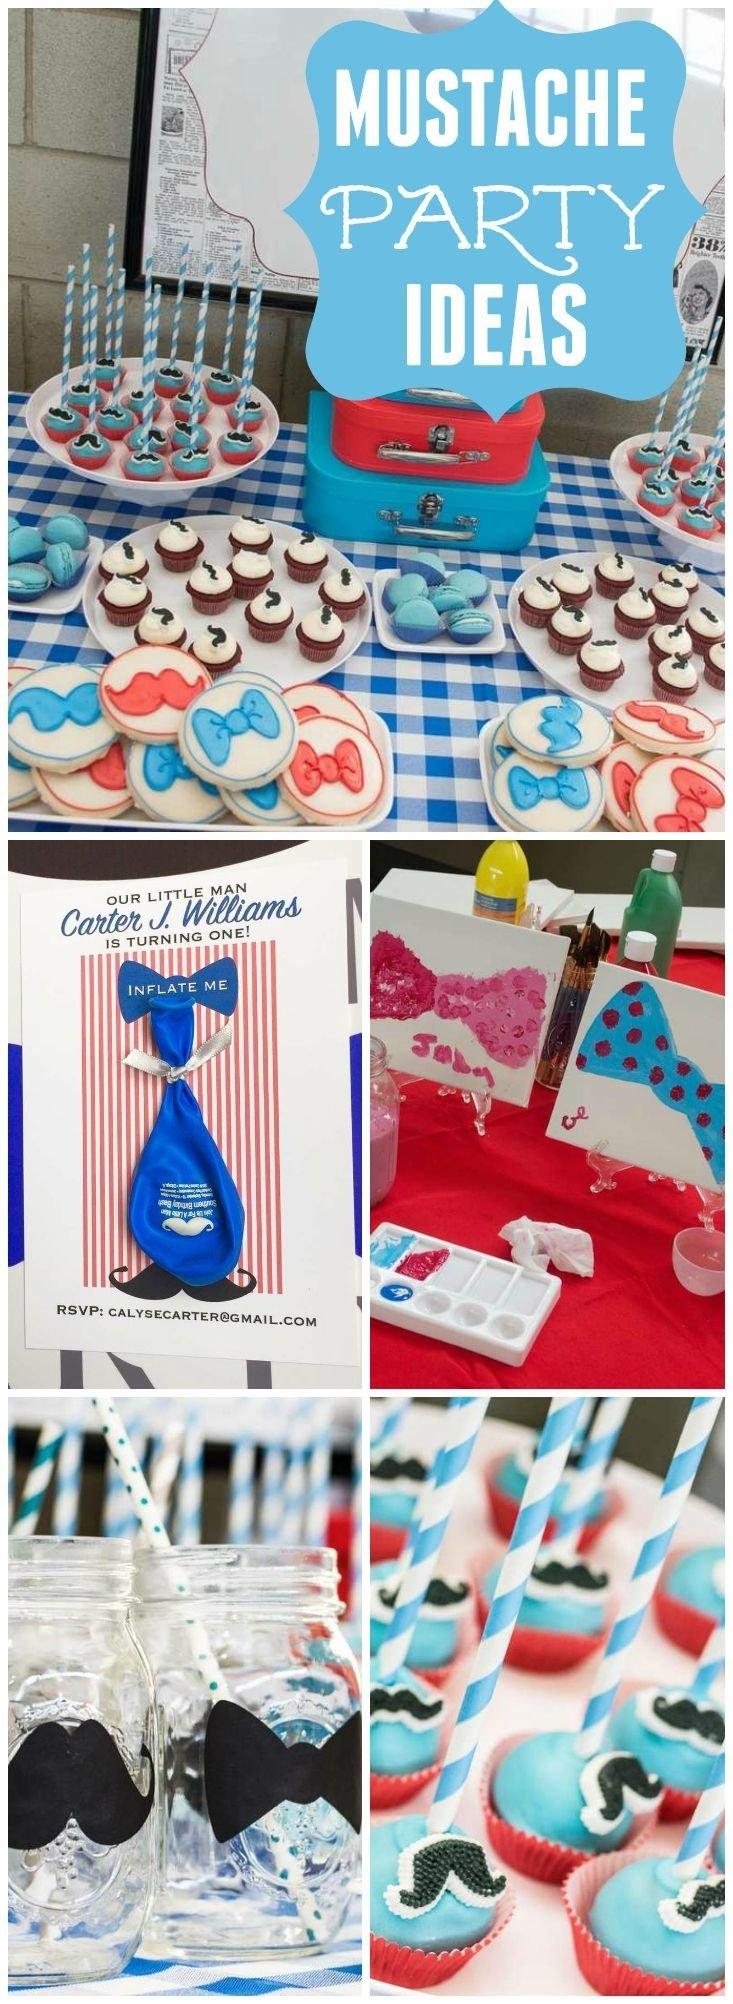 10 Famous Mustache Party Ideas For Kids 267 best mustache bash party ideas images on pinterest anniversary 1